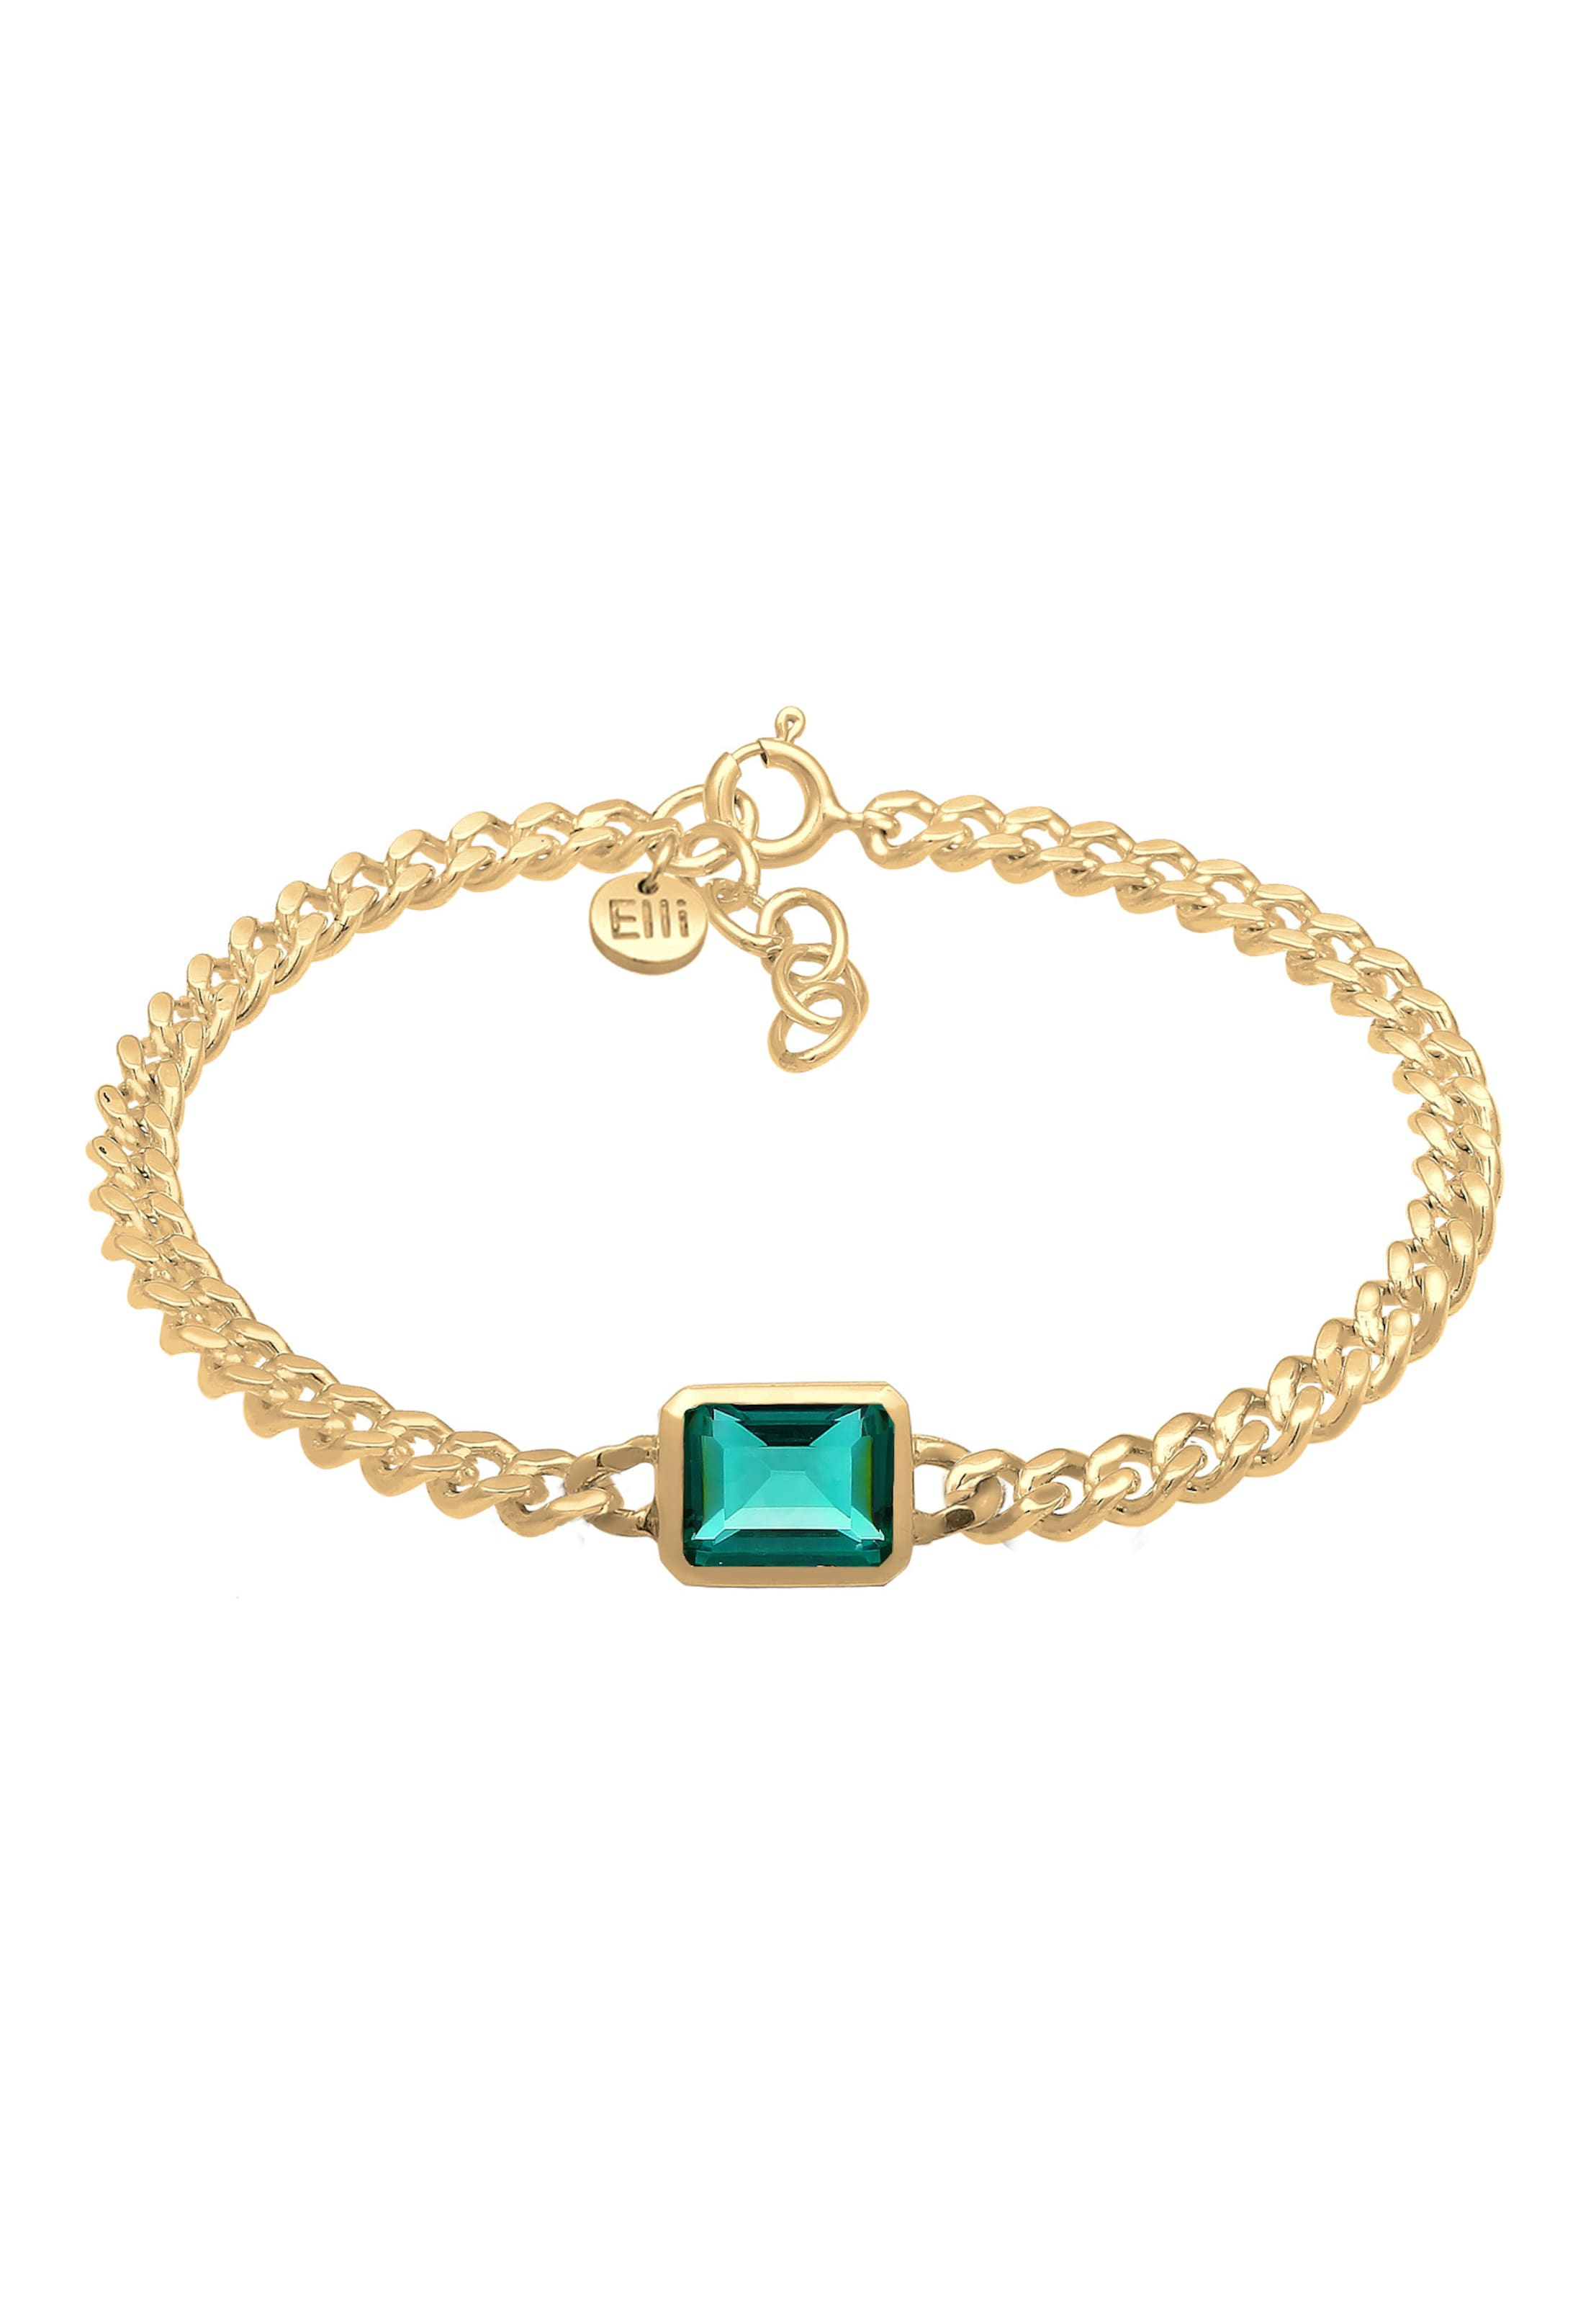 Elli Gold In Armband Elli Gold Premium Armband Premium In sdCtQhr